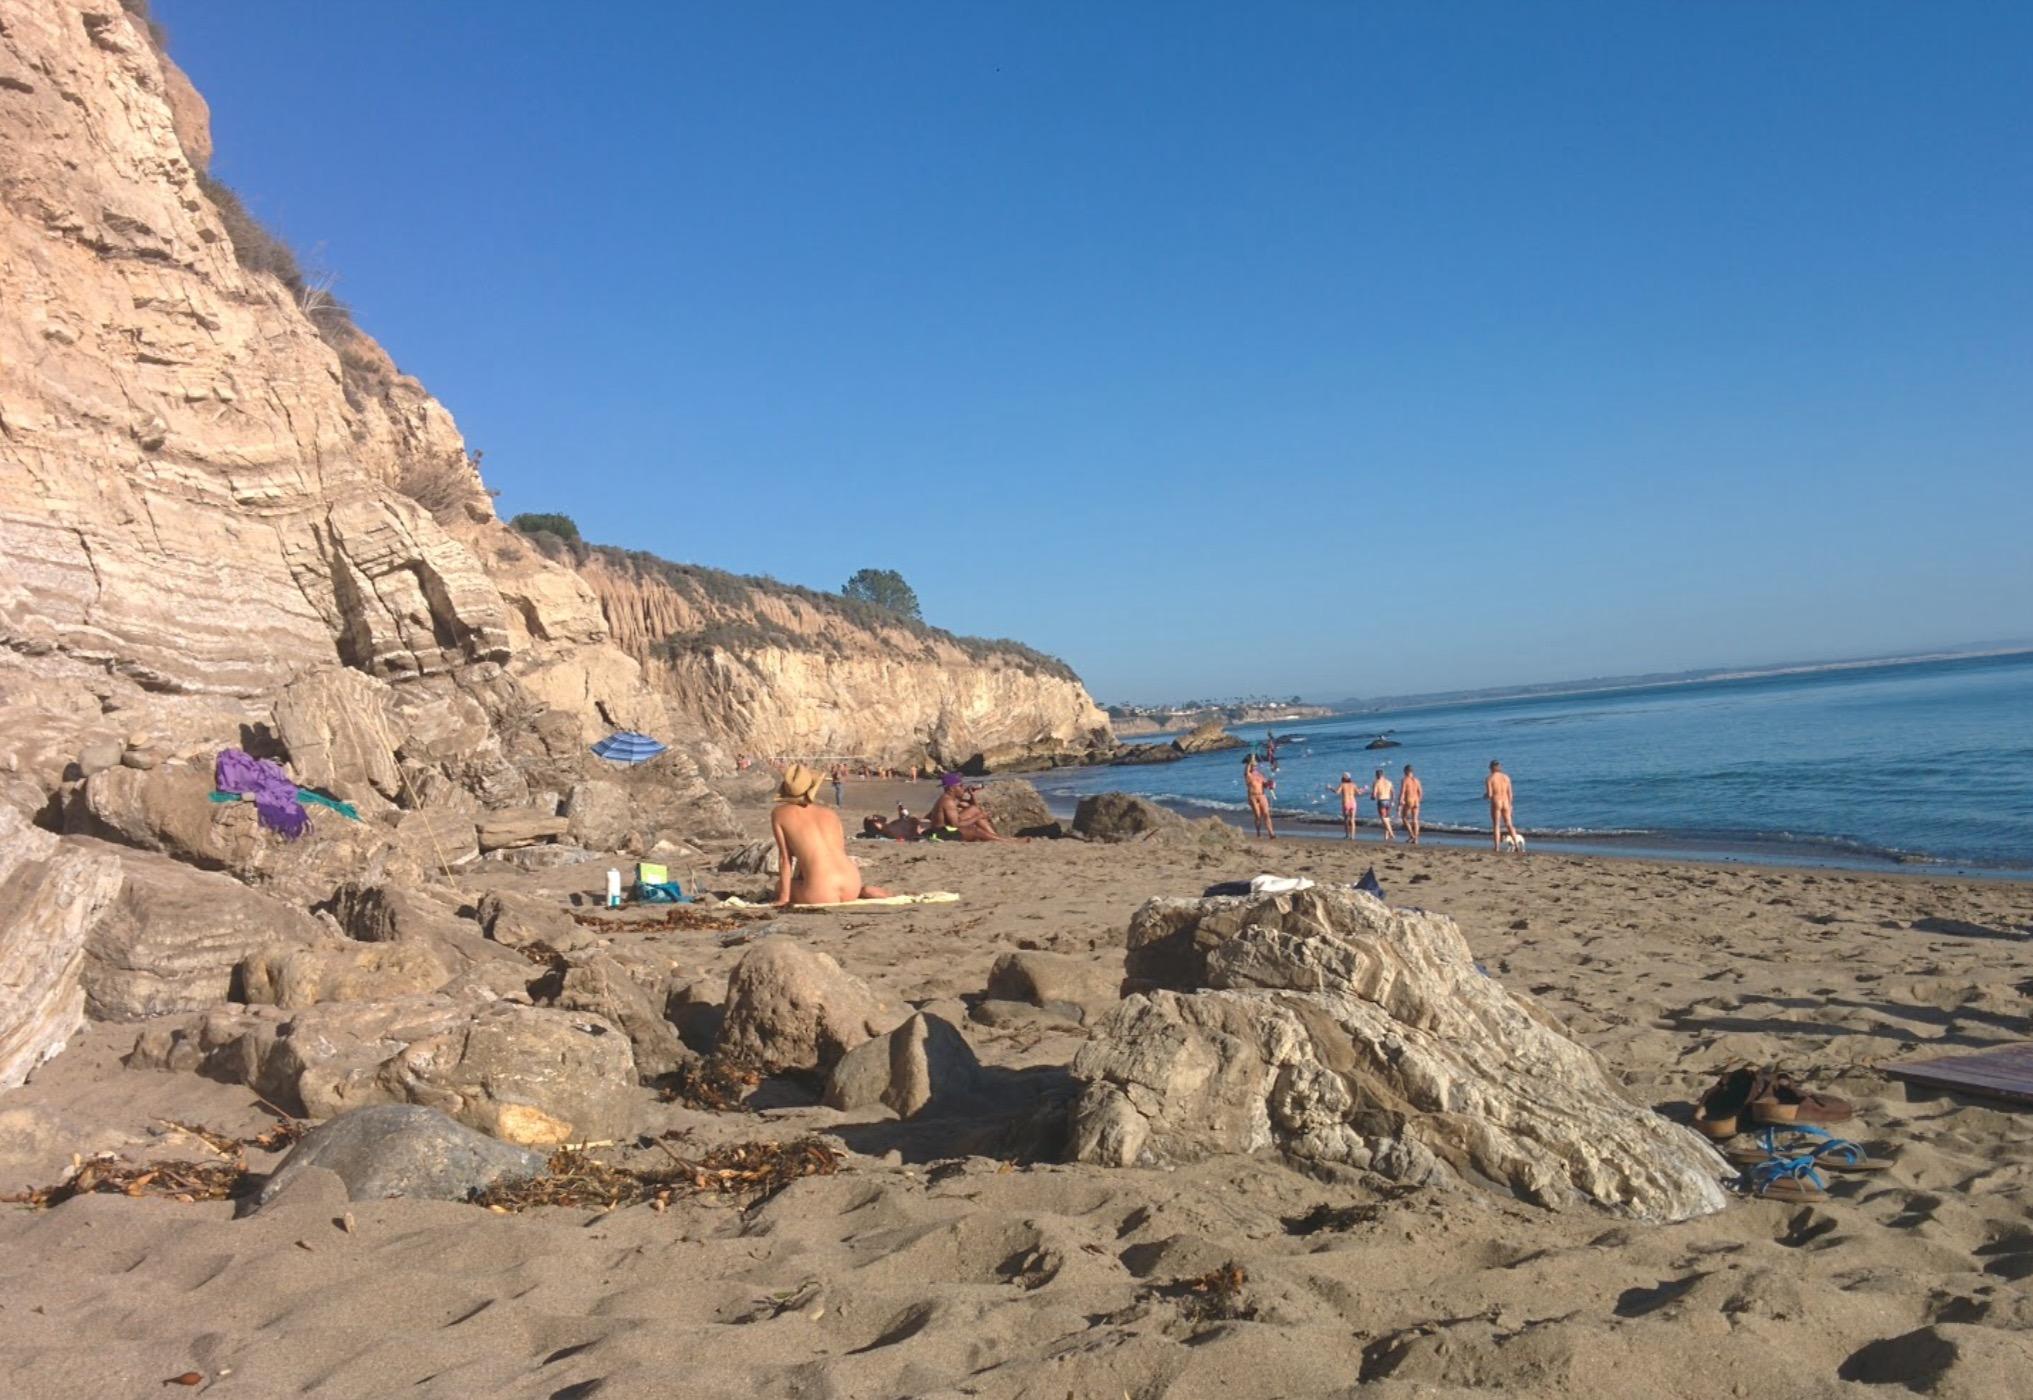 Nude Beach - Pantip-1748